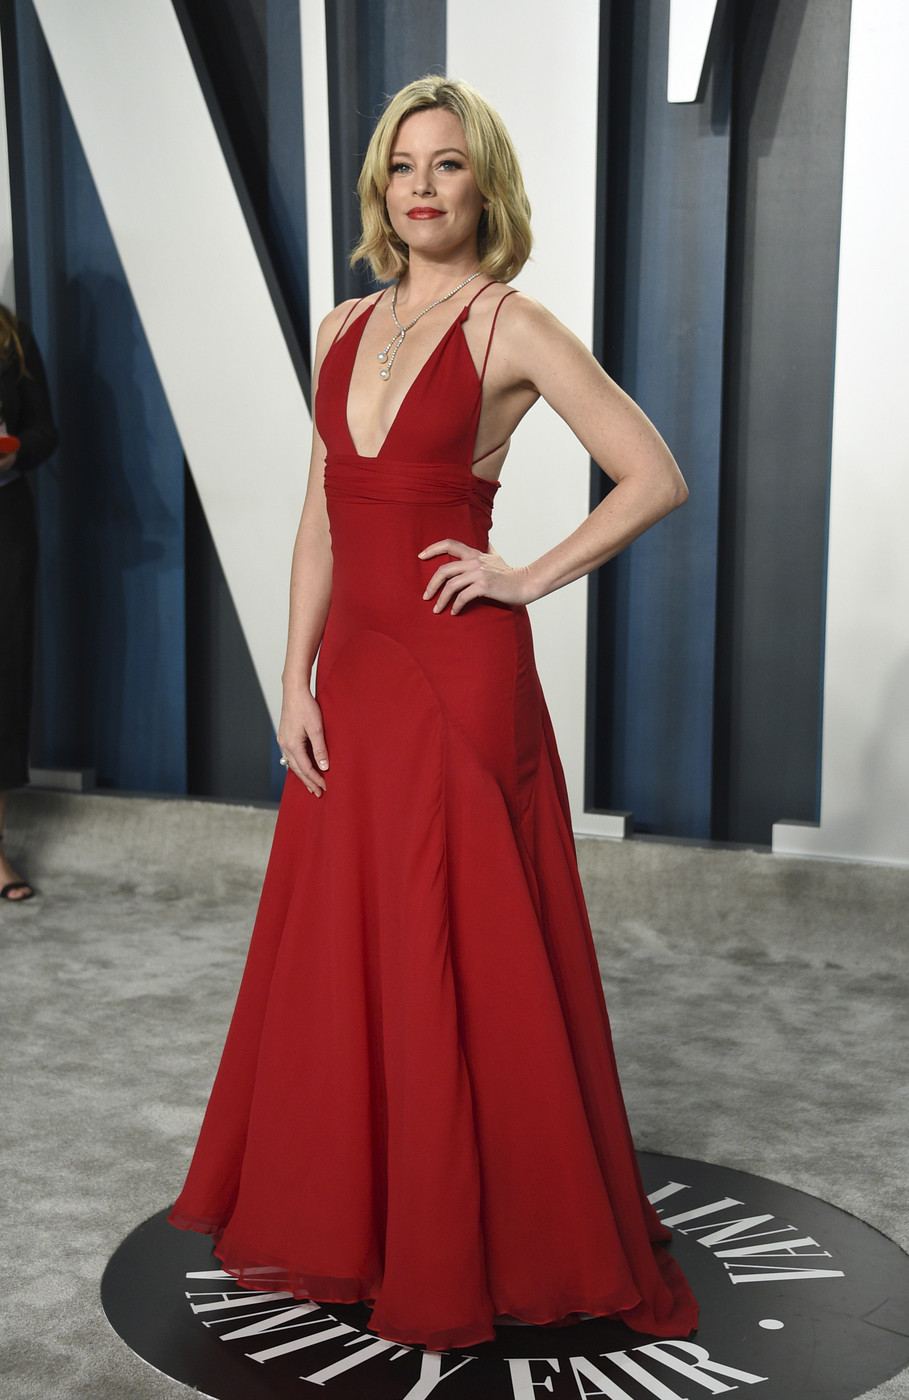 Una dea al Vanity Fair Oscar Party, Emily Ratajkowski nell'olimpo delle star